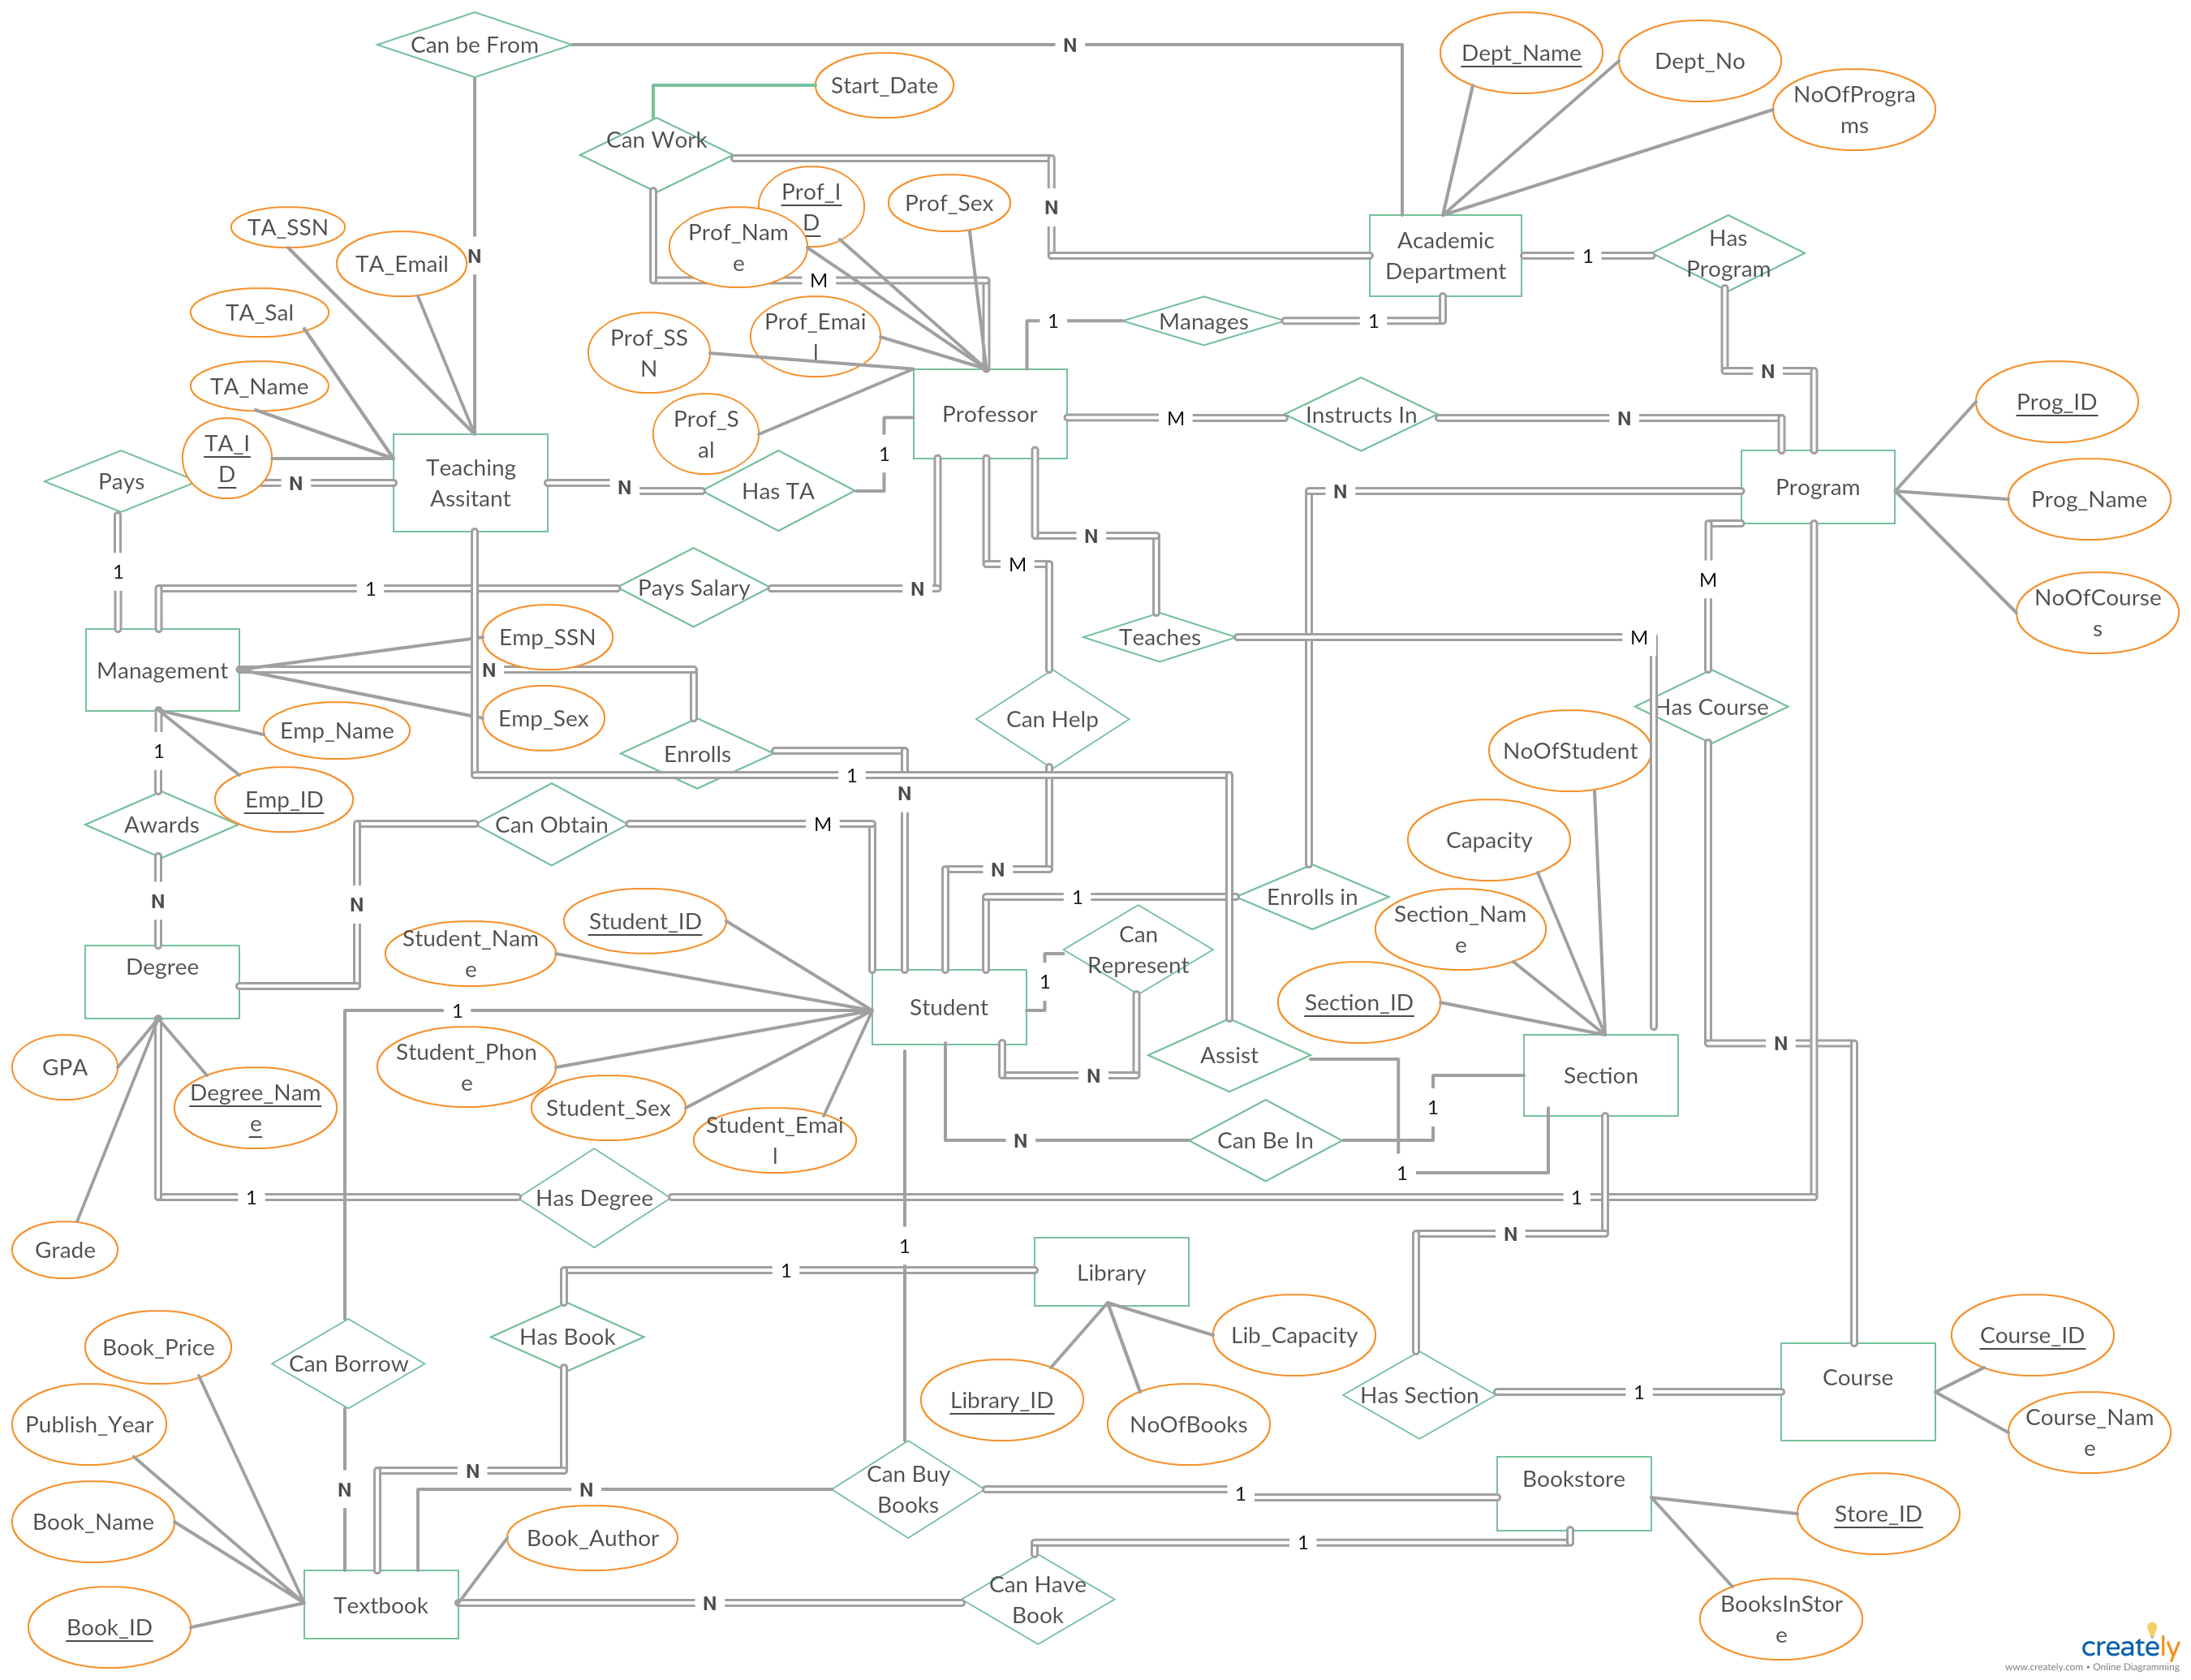 University Management System Er Diagram - You Can Edit This throughout Er Diagram Ppt